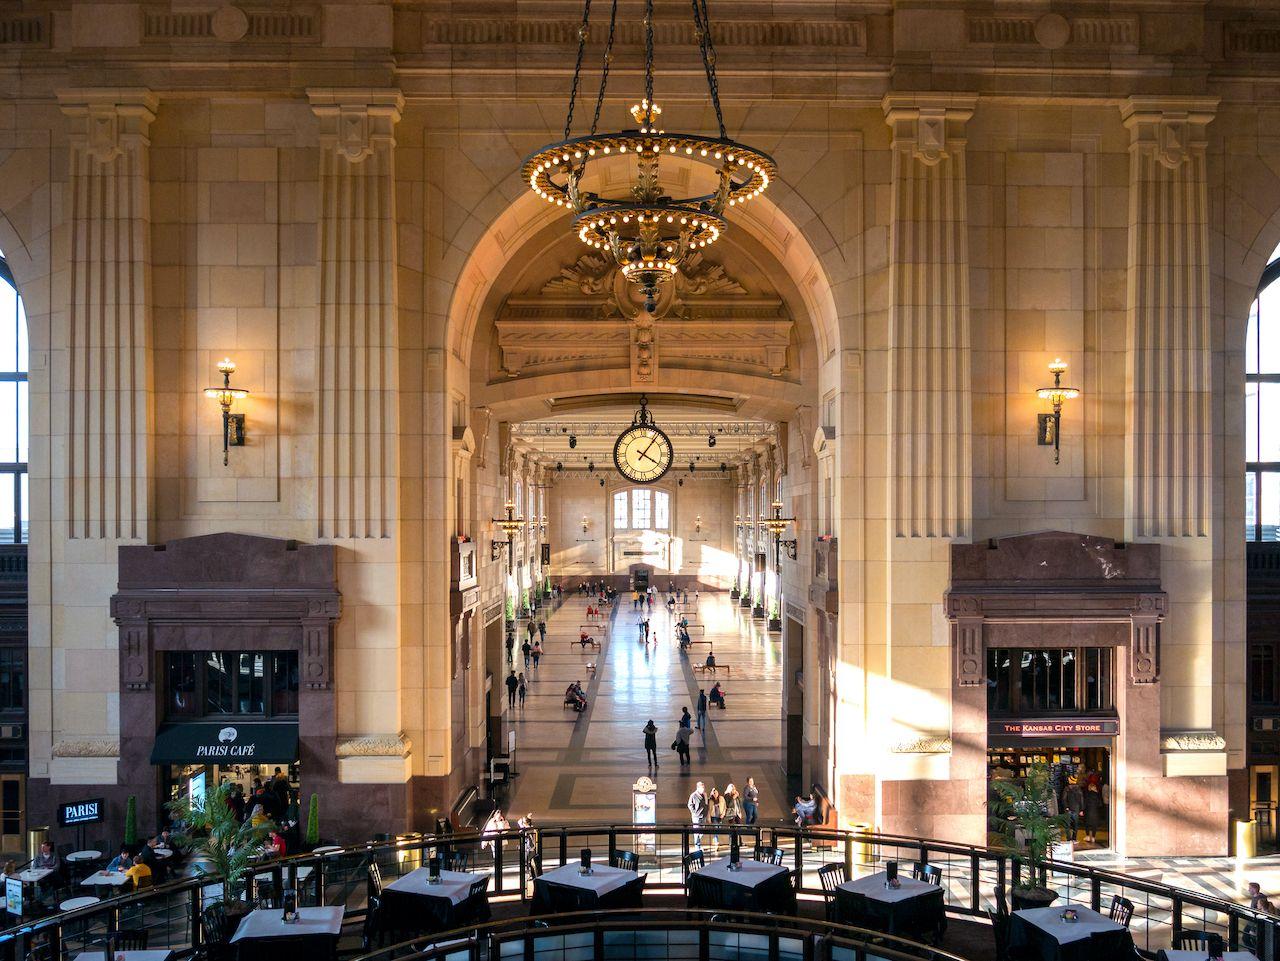 Kansas,City,,Mo,/,United,States,Of,America,-,February beautiful train stations